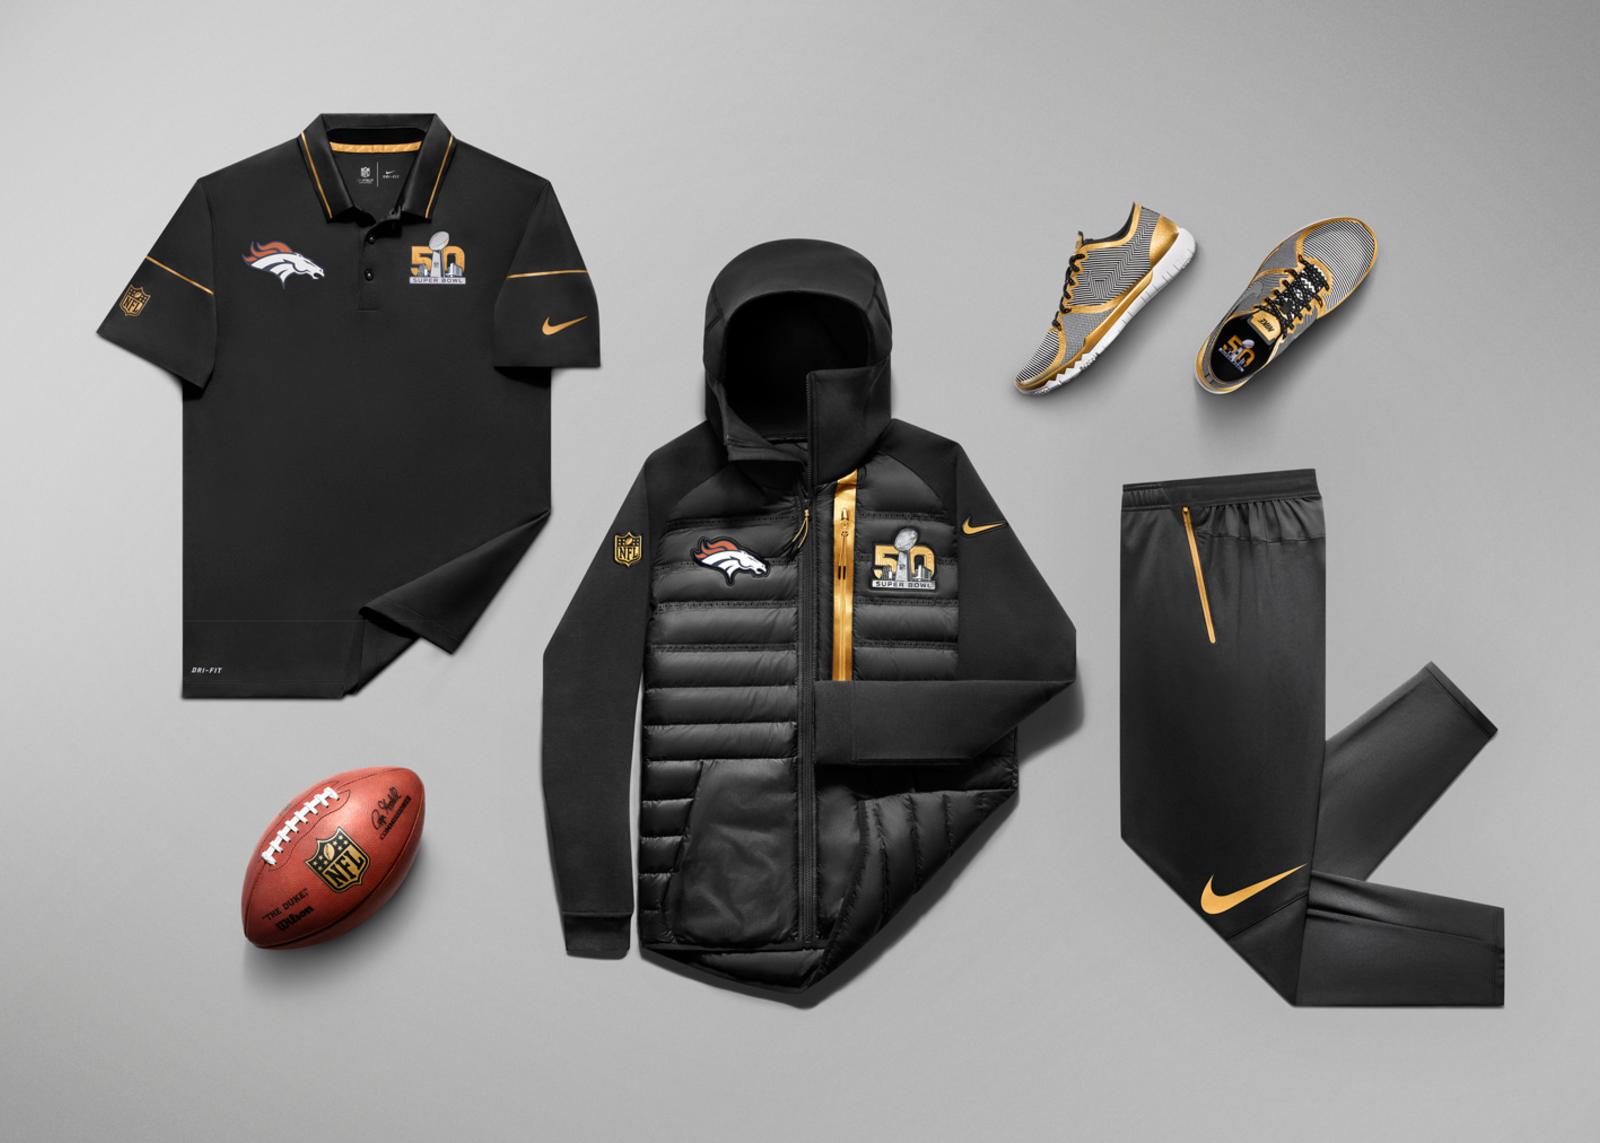 "reputable site 83a57 79d24 A pocas semanas del tan anticipado evento deportivo, hemos podido echarle  un vistazo a la especial colección ""Super Bowl 50 Nike Gold Collection"" que  ha ..."